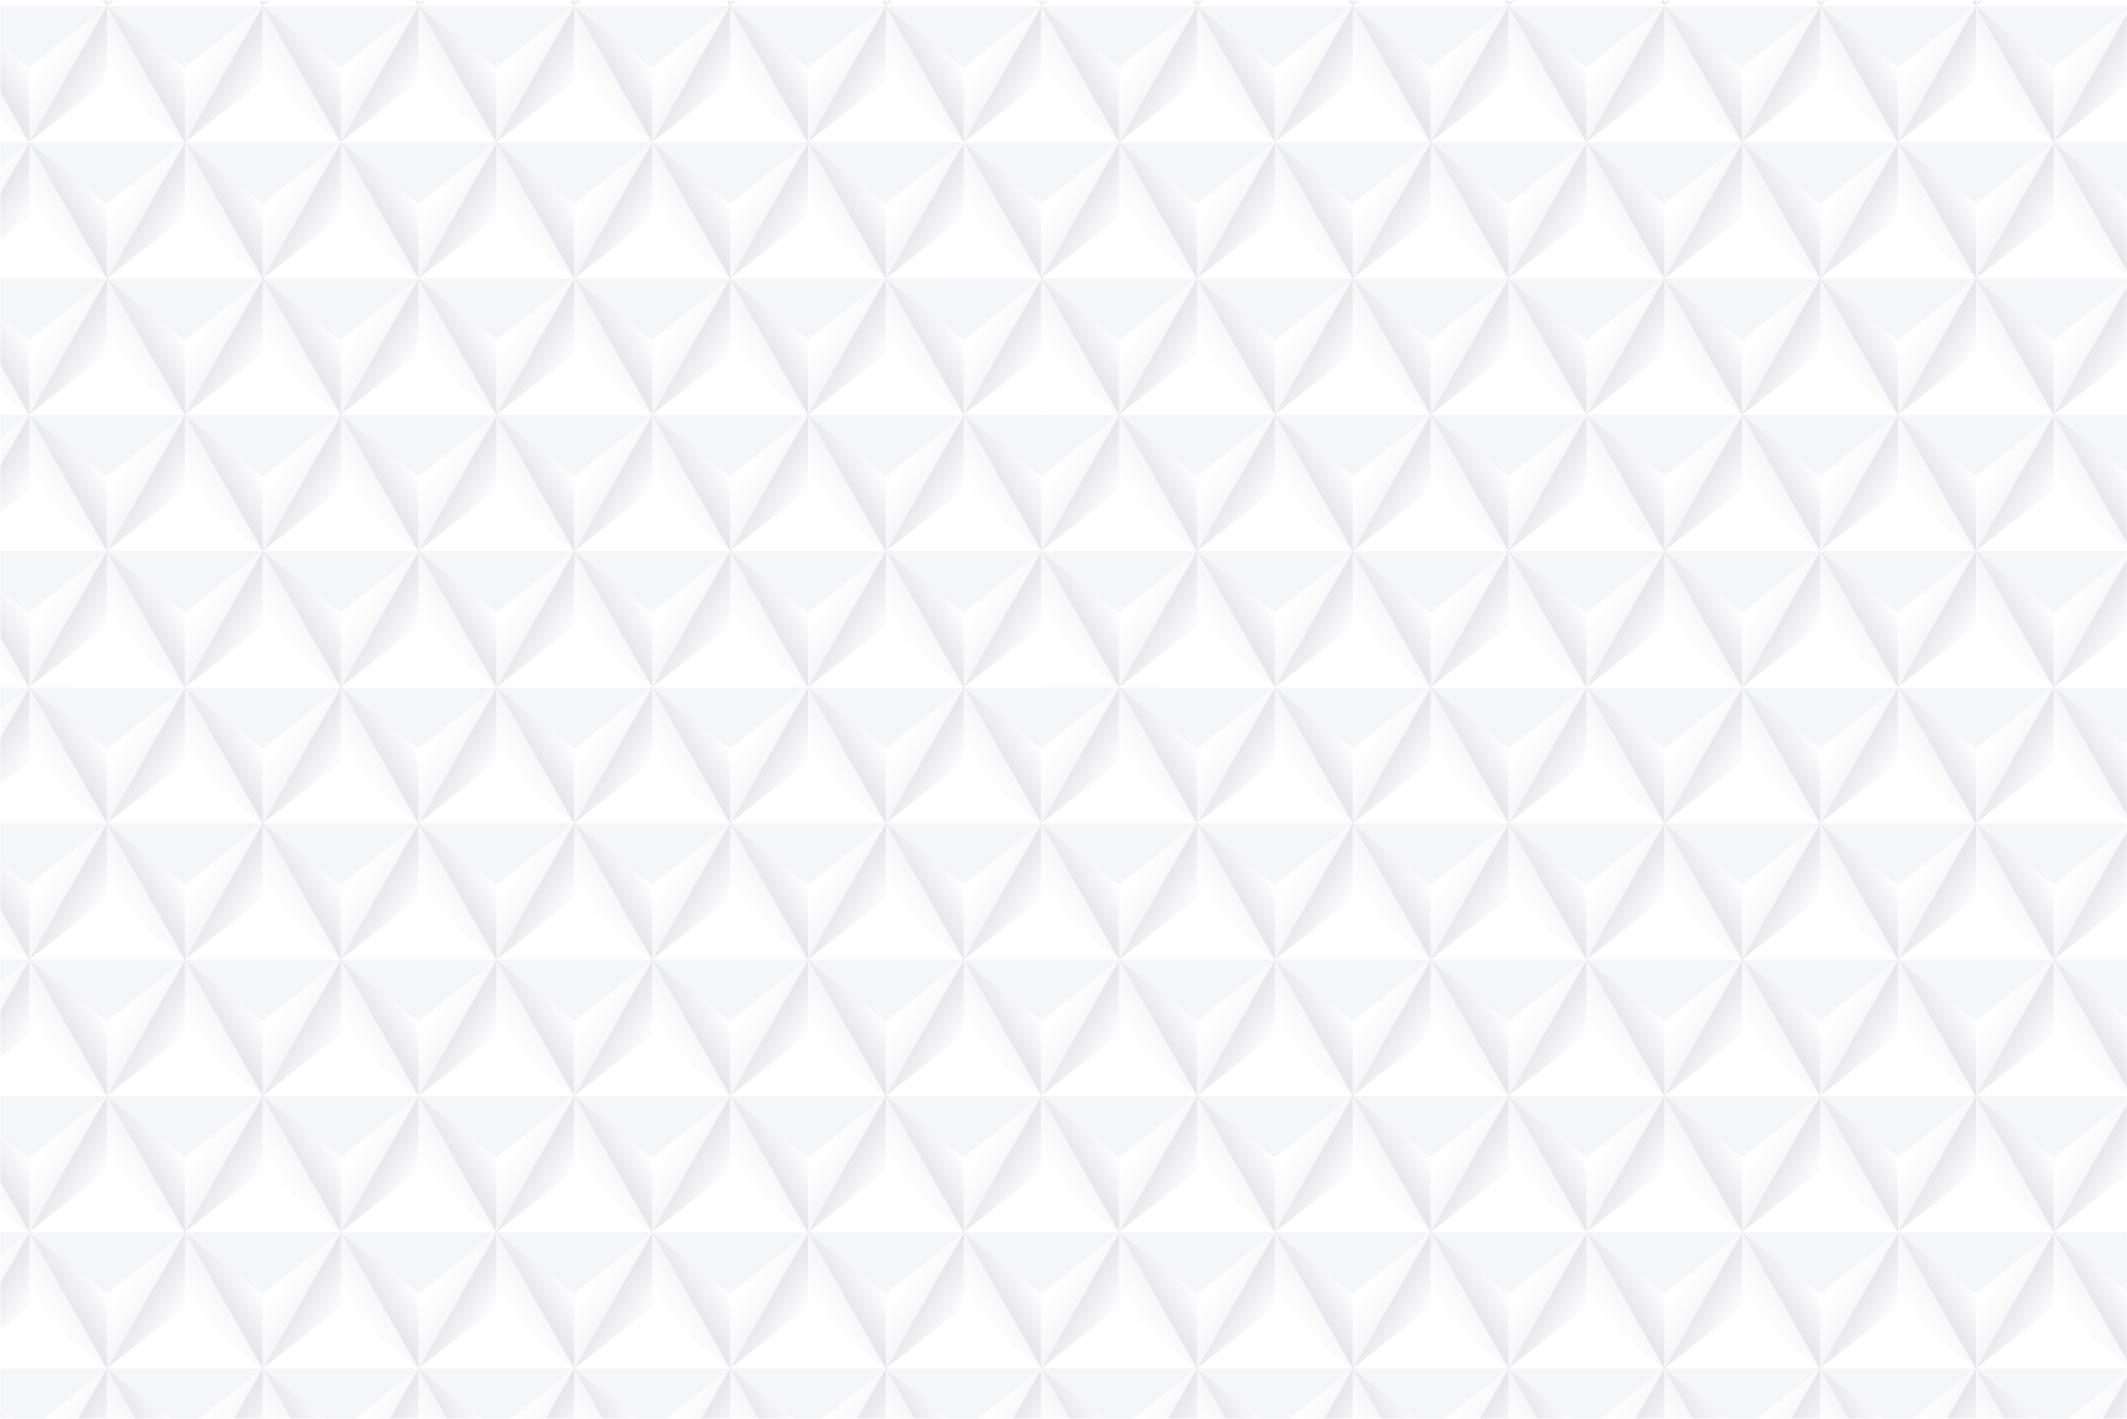 White decorative seamless textures example image 9